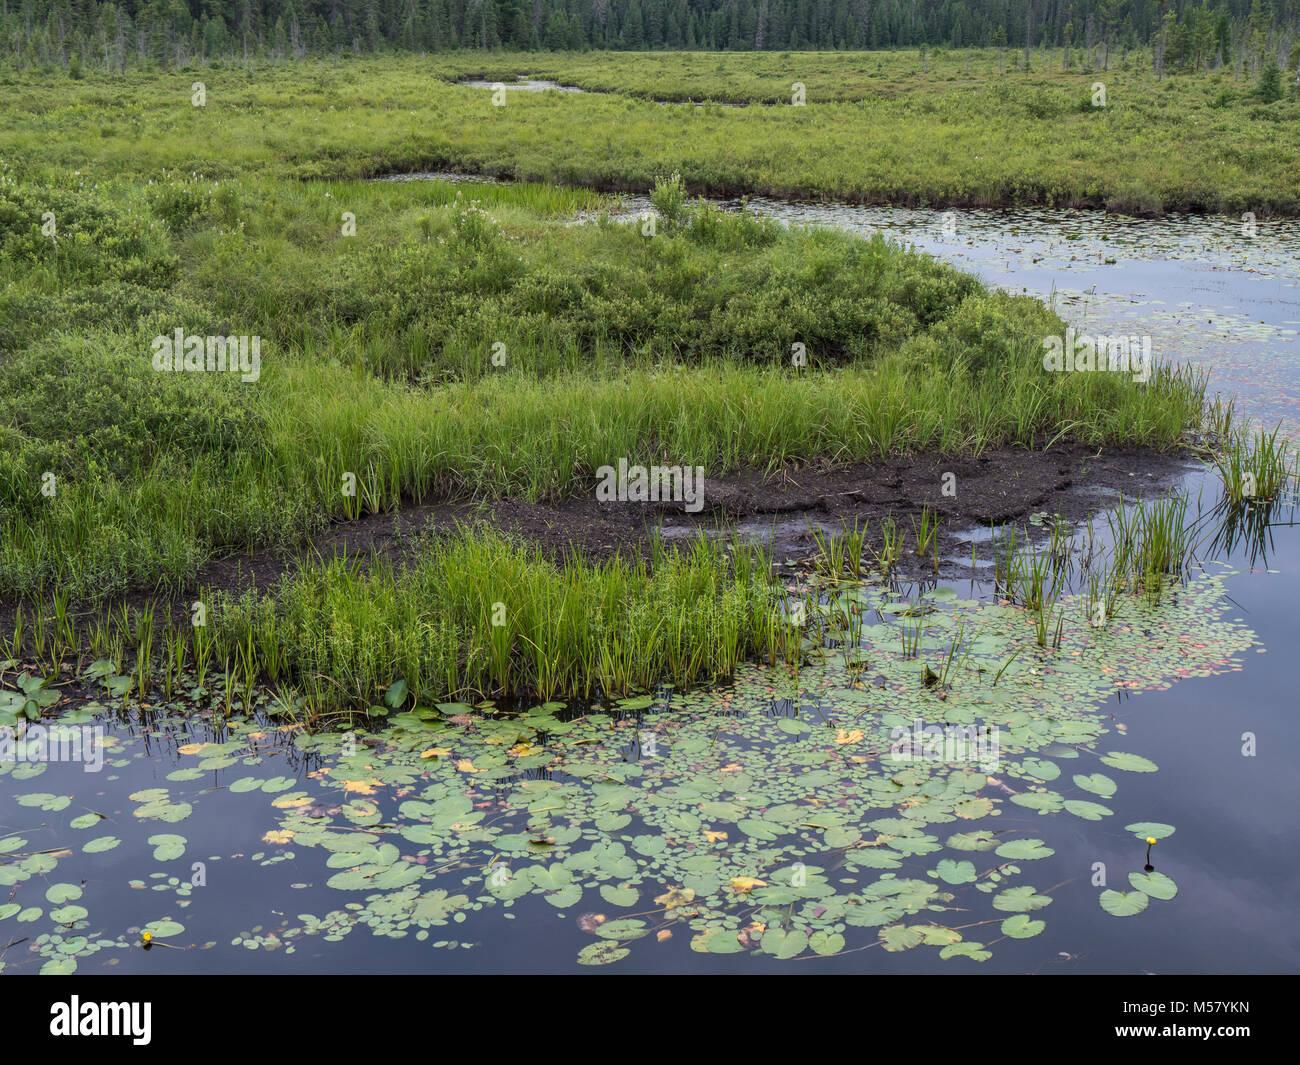 Lily pads, Spruce Bog Boardwalk, Algonquin Provincial Park, Ontario, Canada. - Stock Image